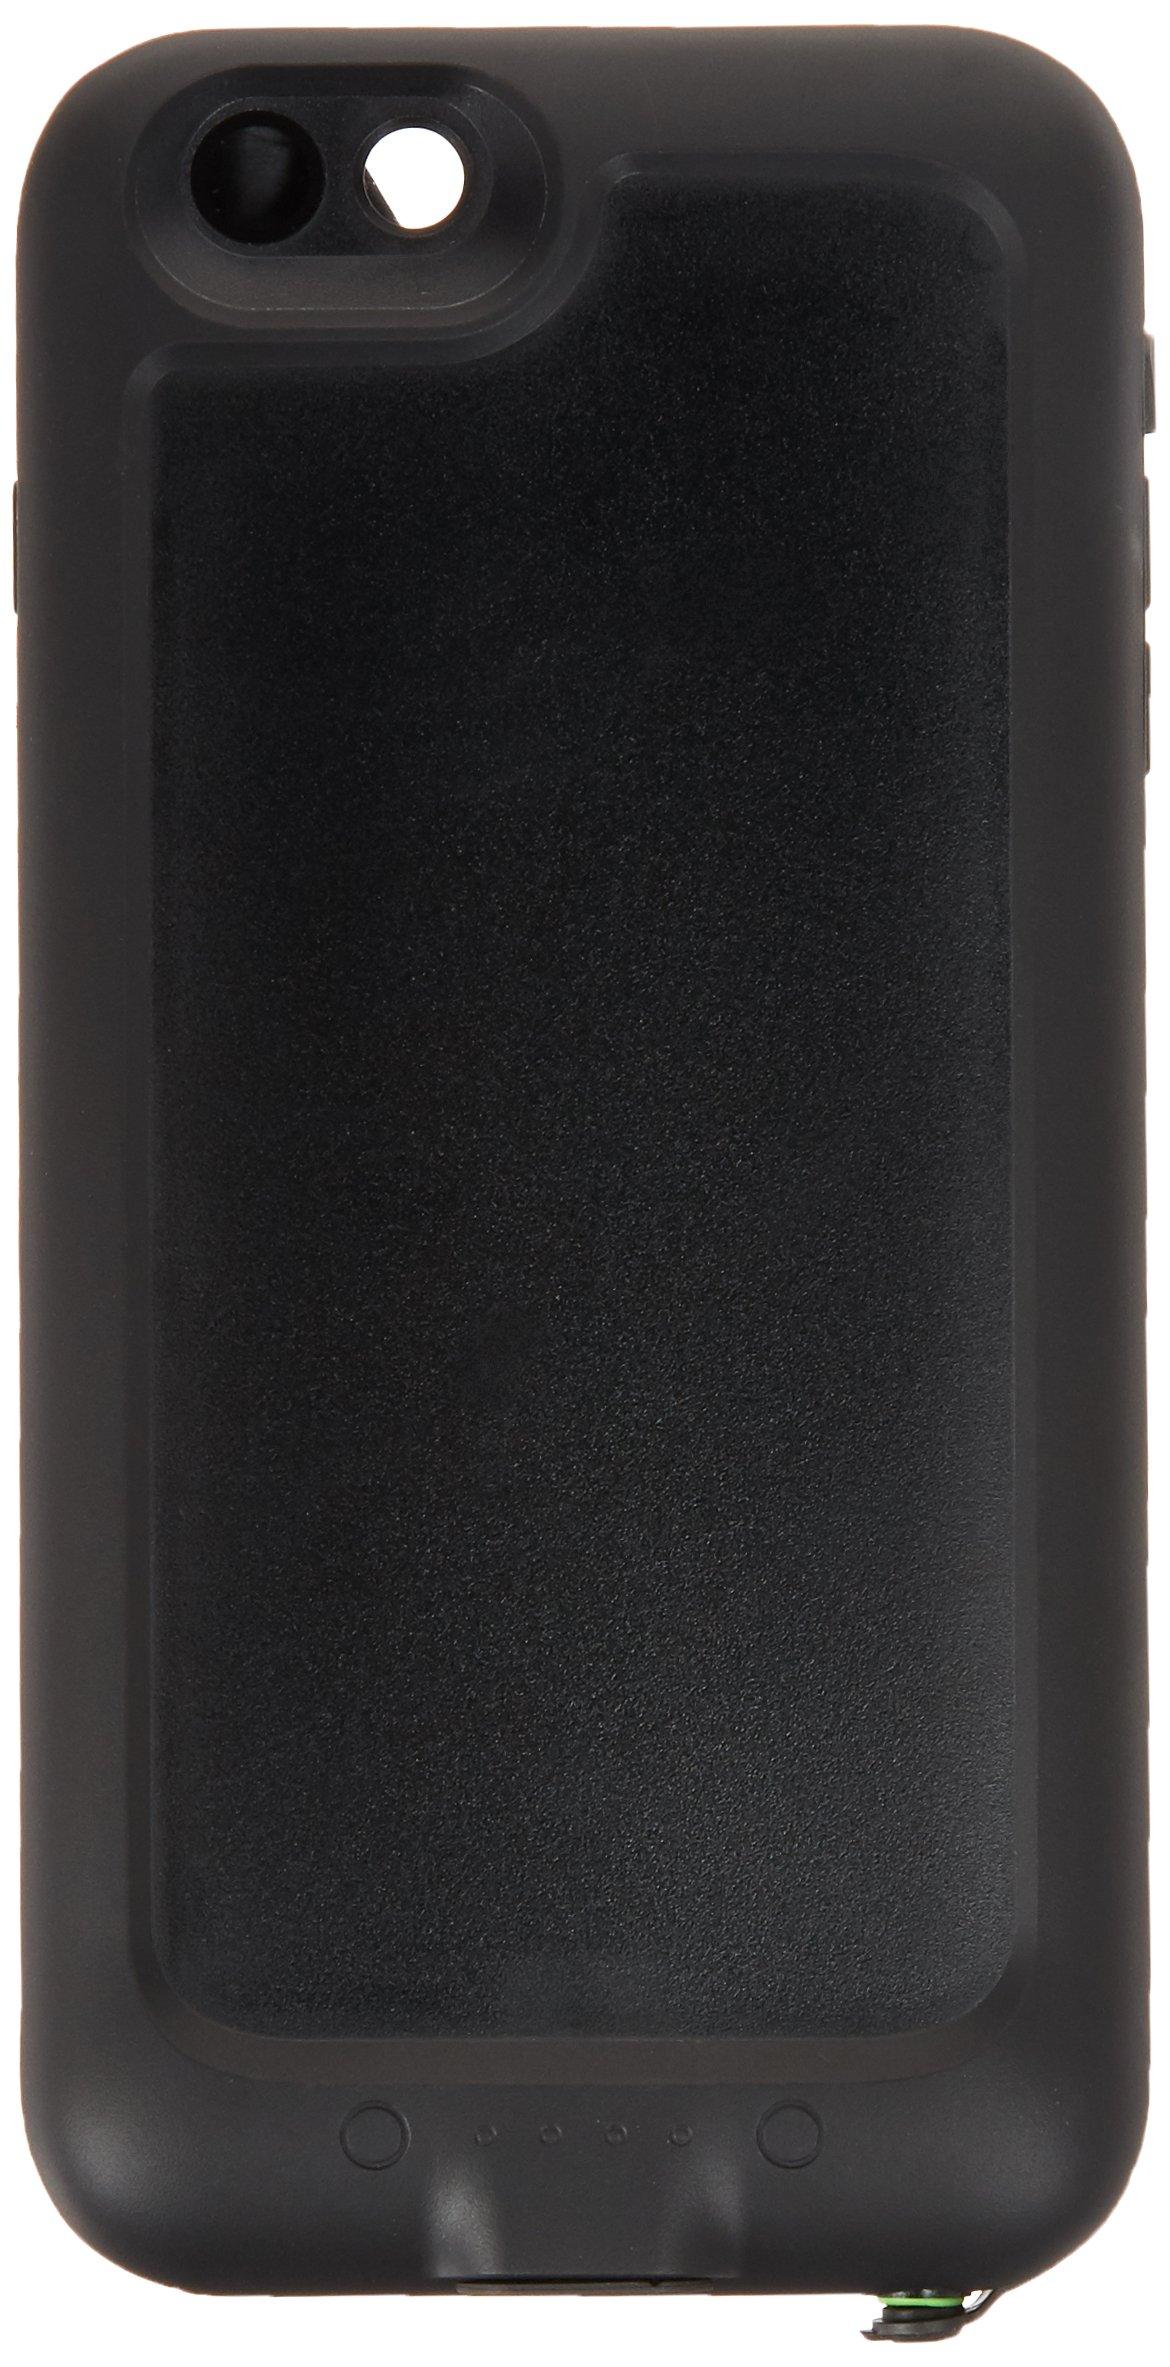 mophie waterproof juice pack H2Pro for iPhone 6 Plus/6S Plus (2,600mAh) - Black